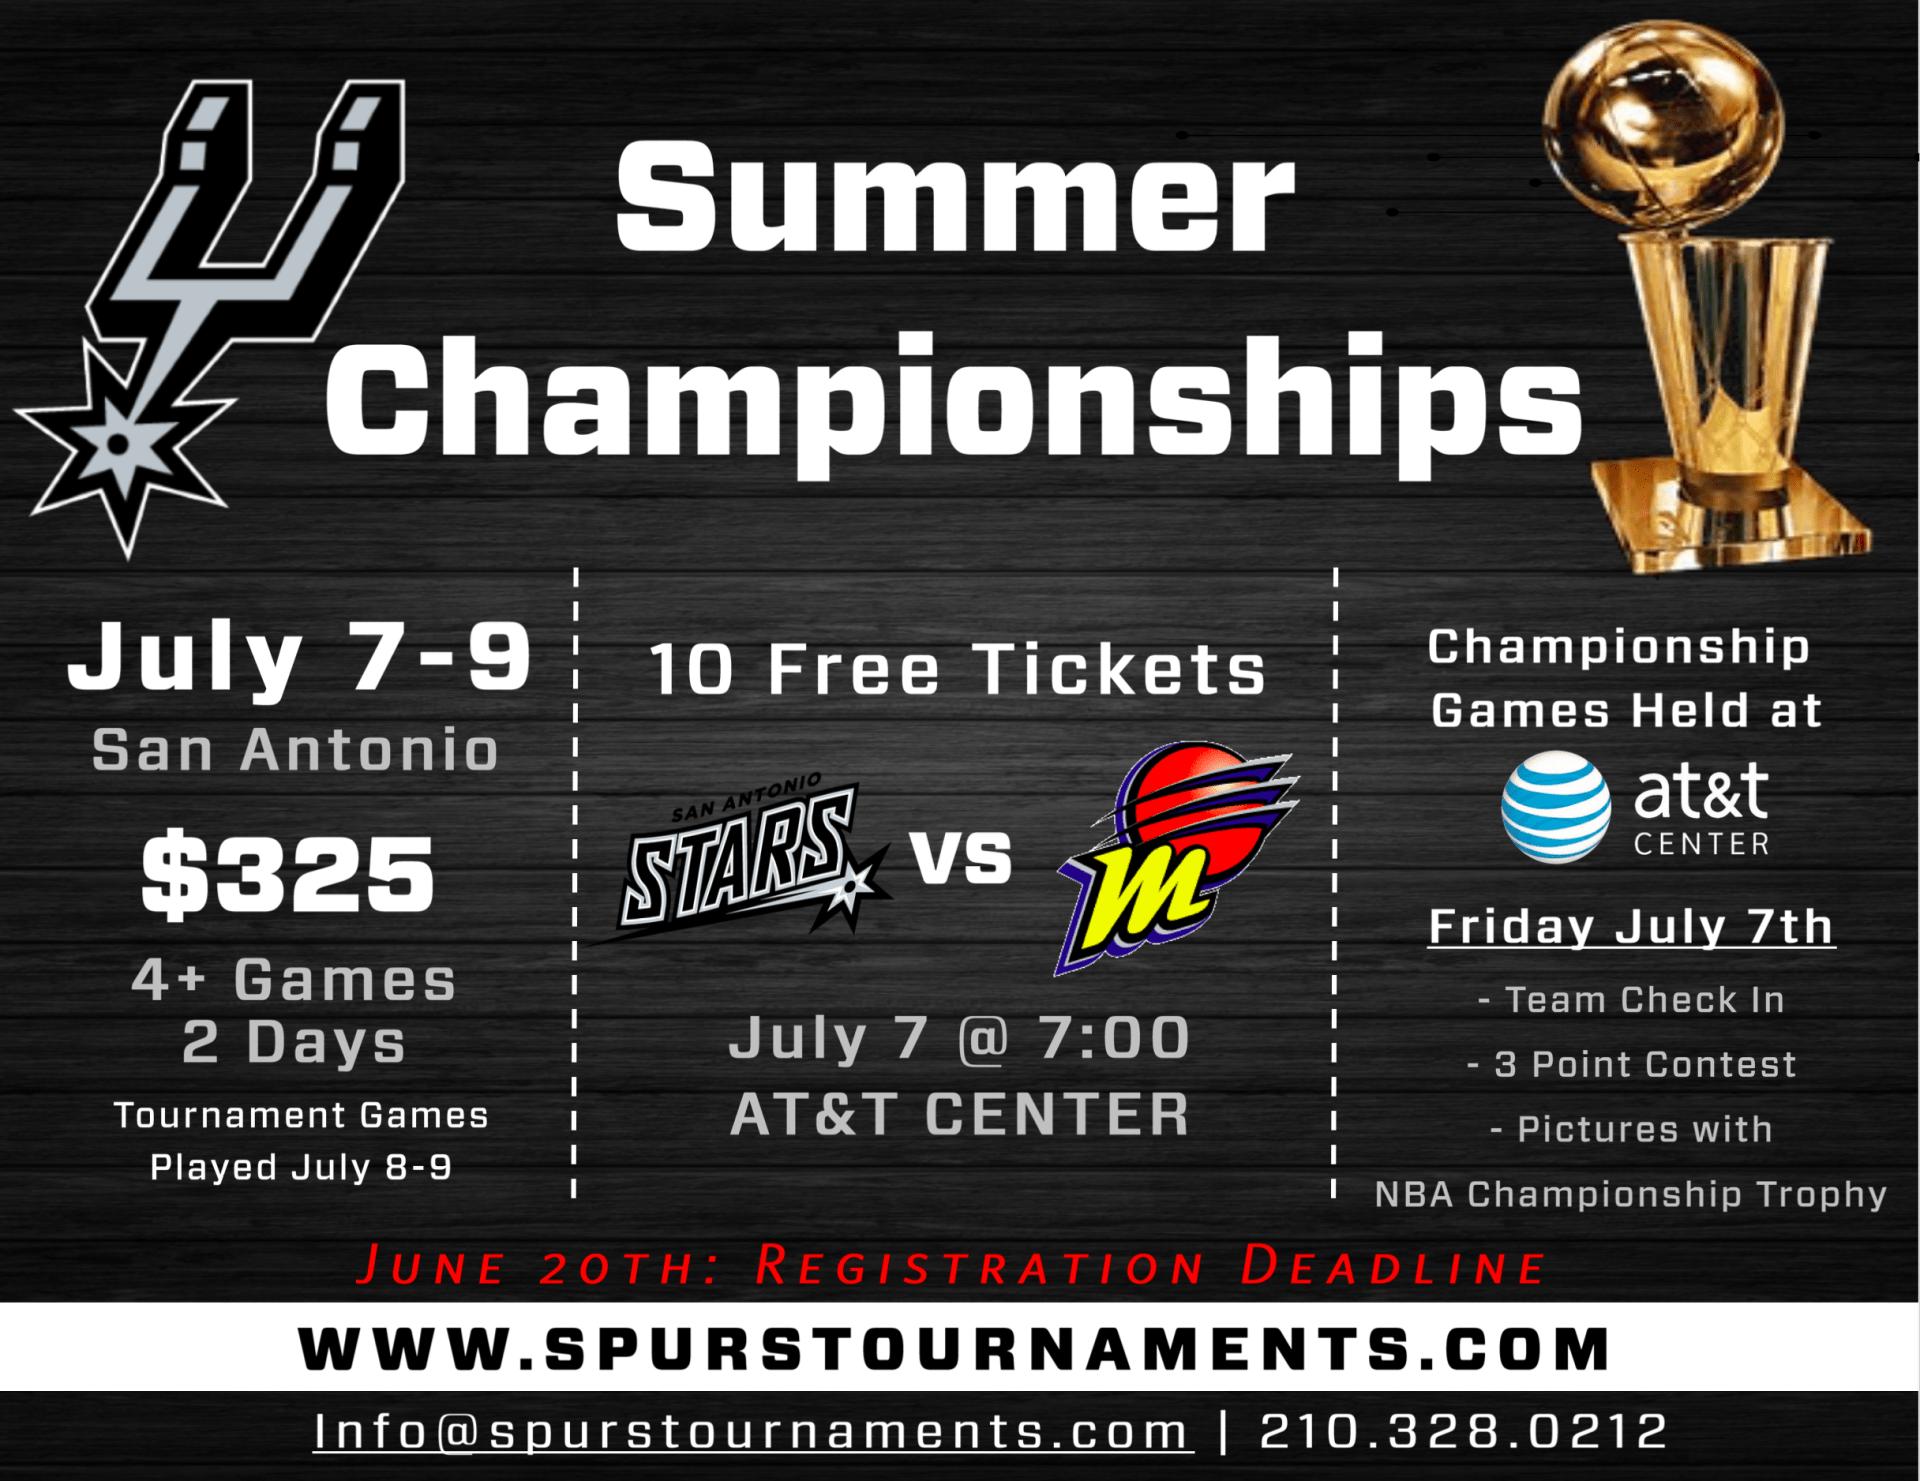 Summer Championships July 7-9